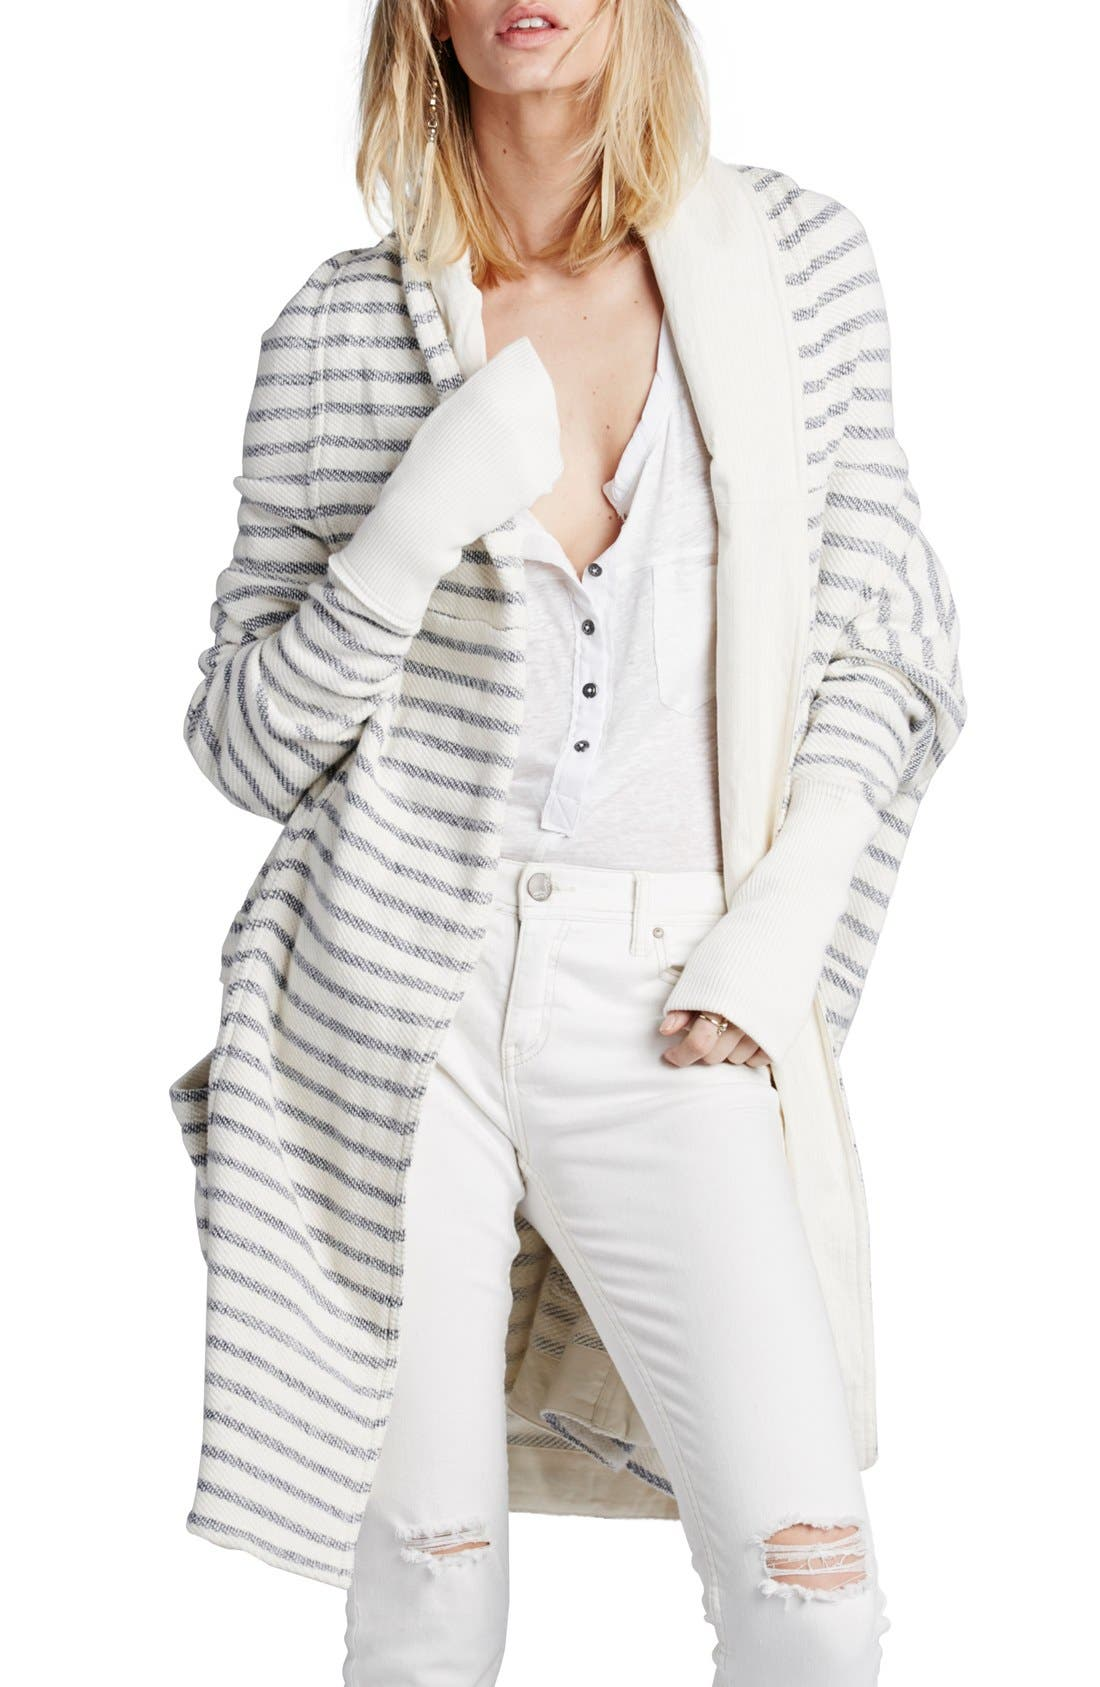 Alternate Image 1 Selected - Free People 'Long Island' Stripe Hooded Cardigan